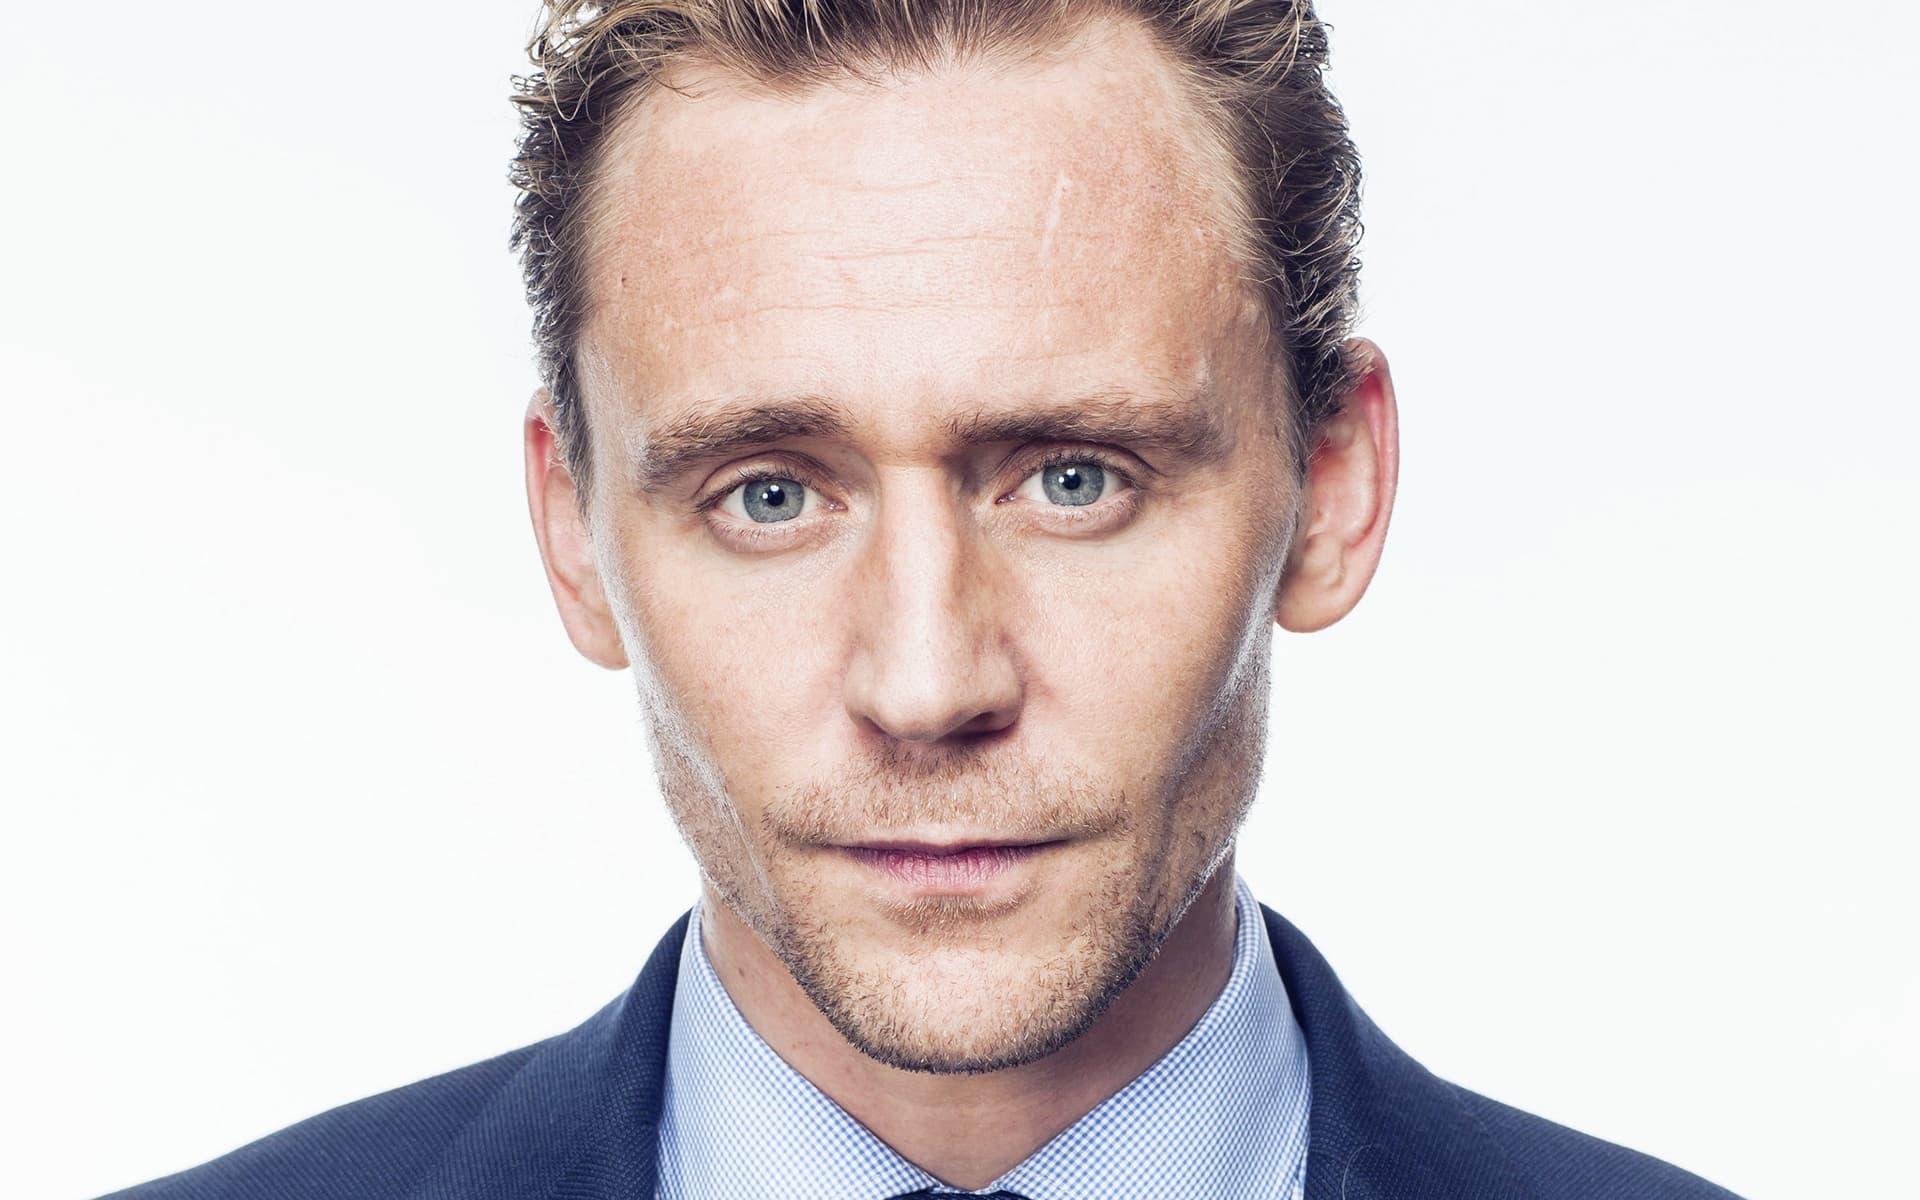 Tom Hiddleston High Quality Wallpaper